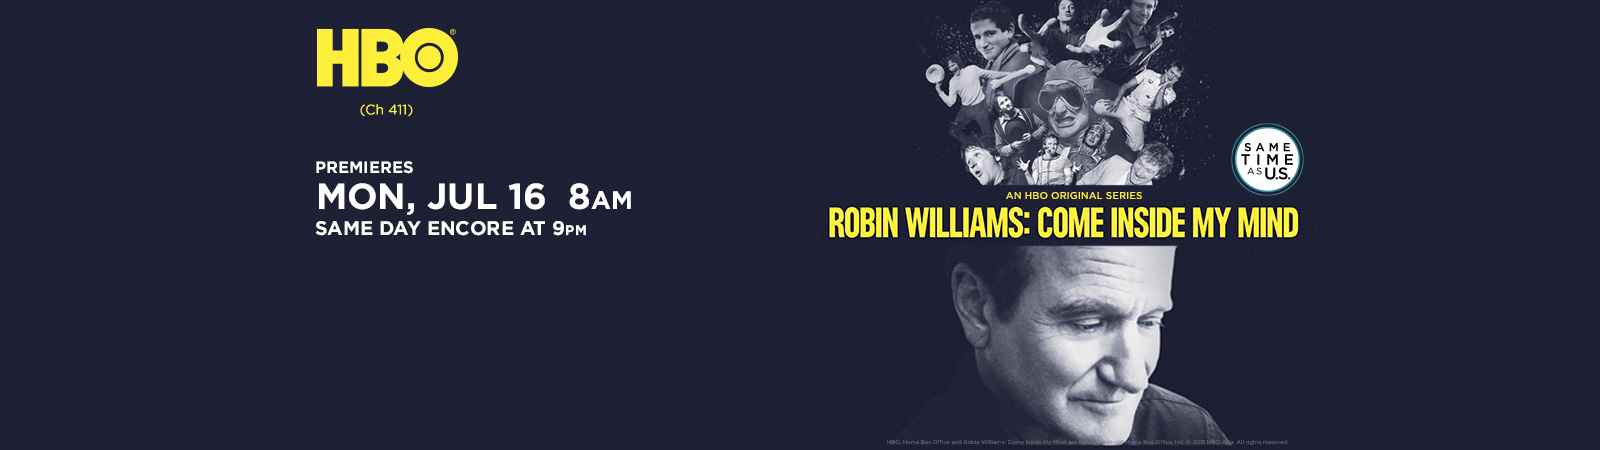 HBO - Robin Williams